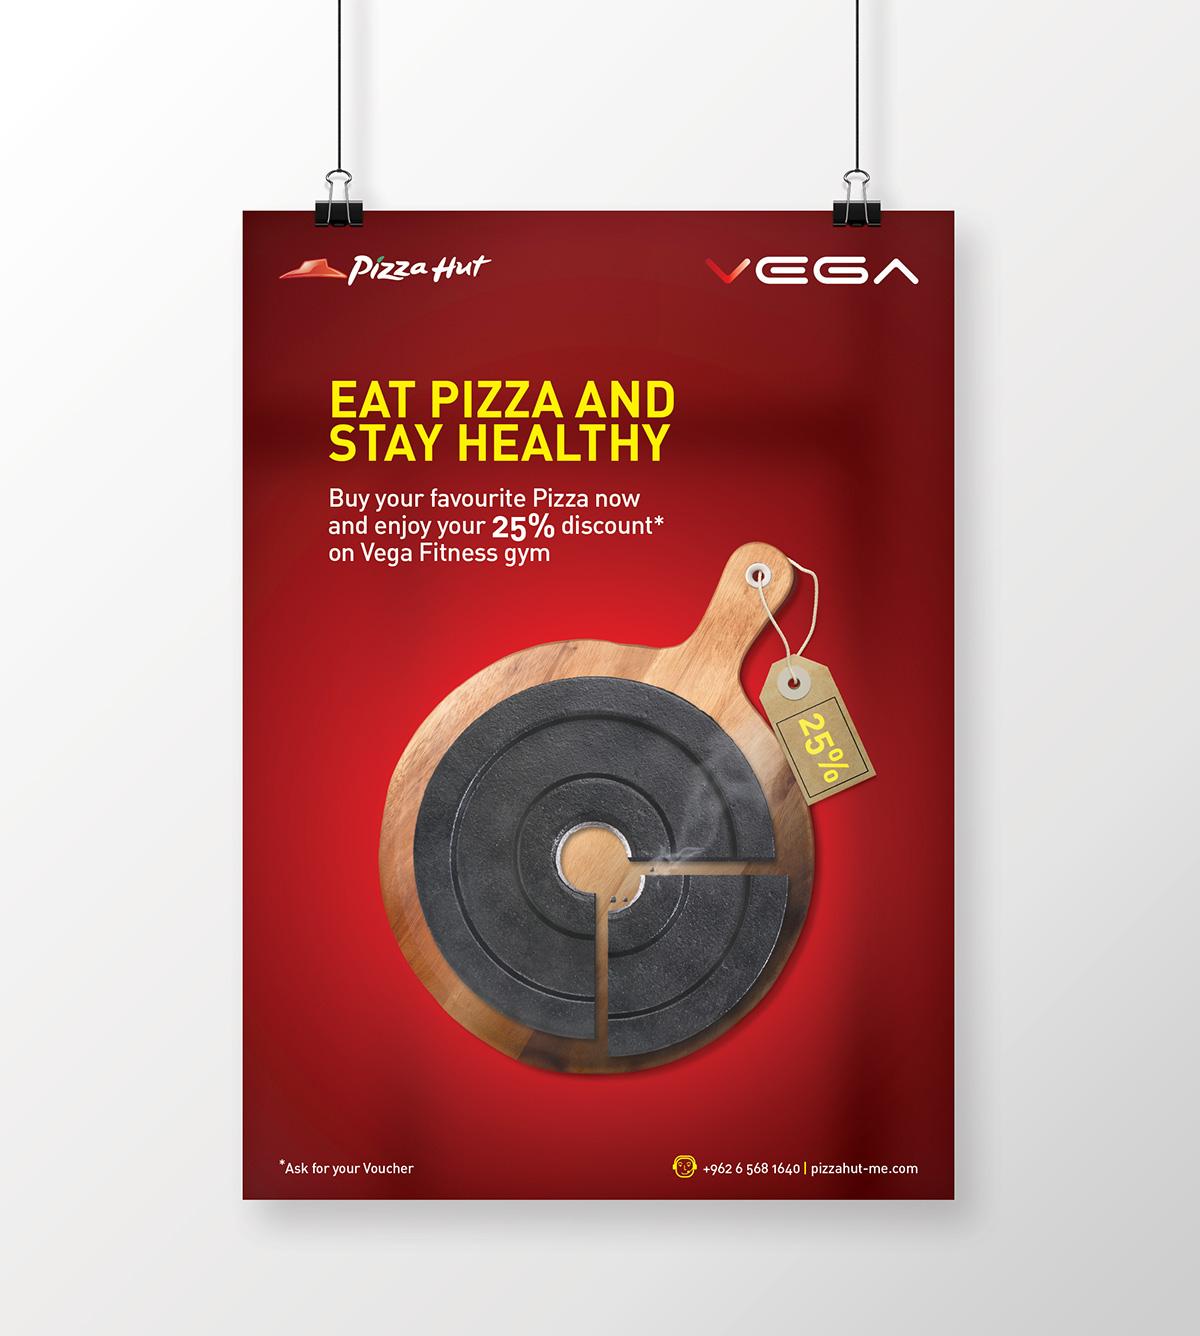 PIZZA HUT Offer for Vega Gym members (Concept) on Pantone